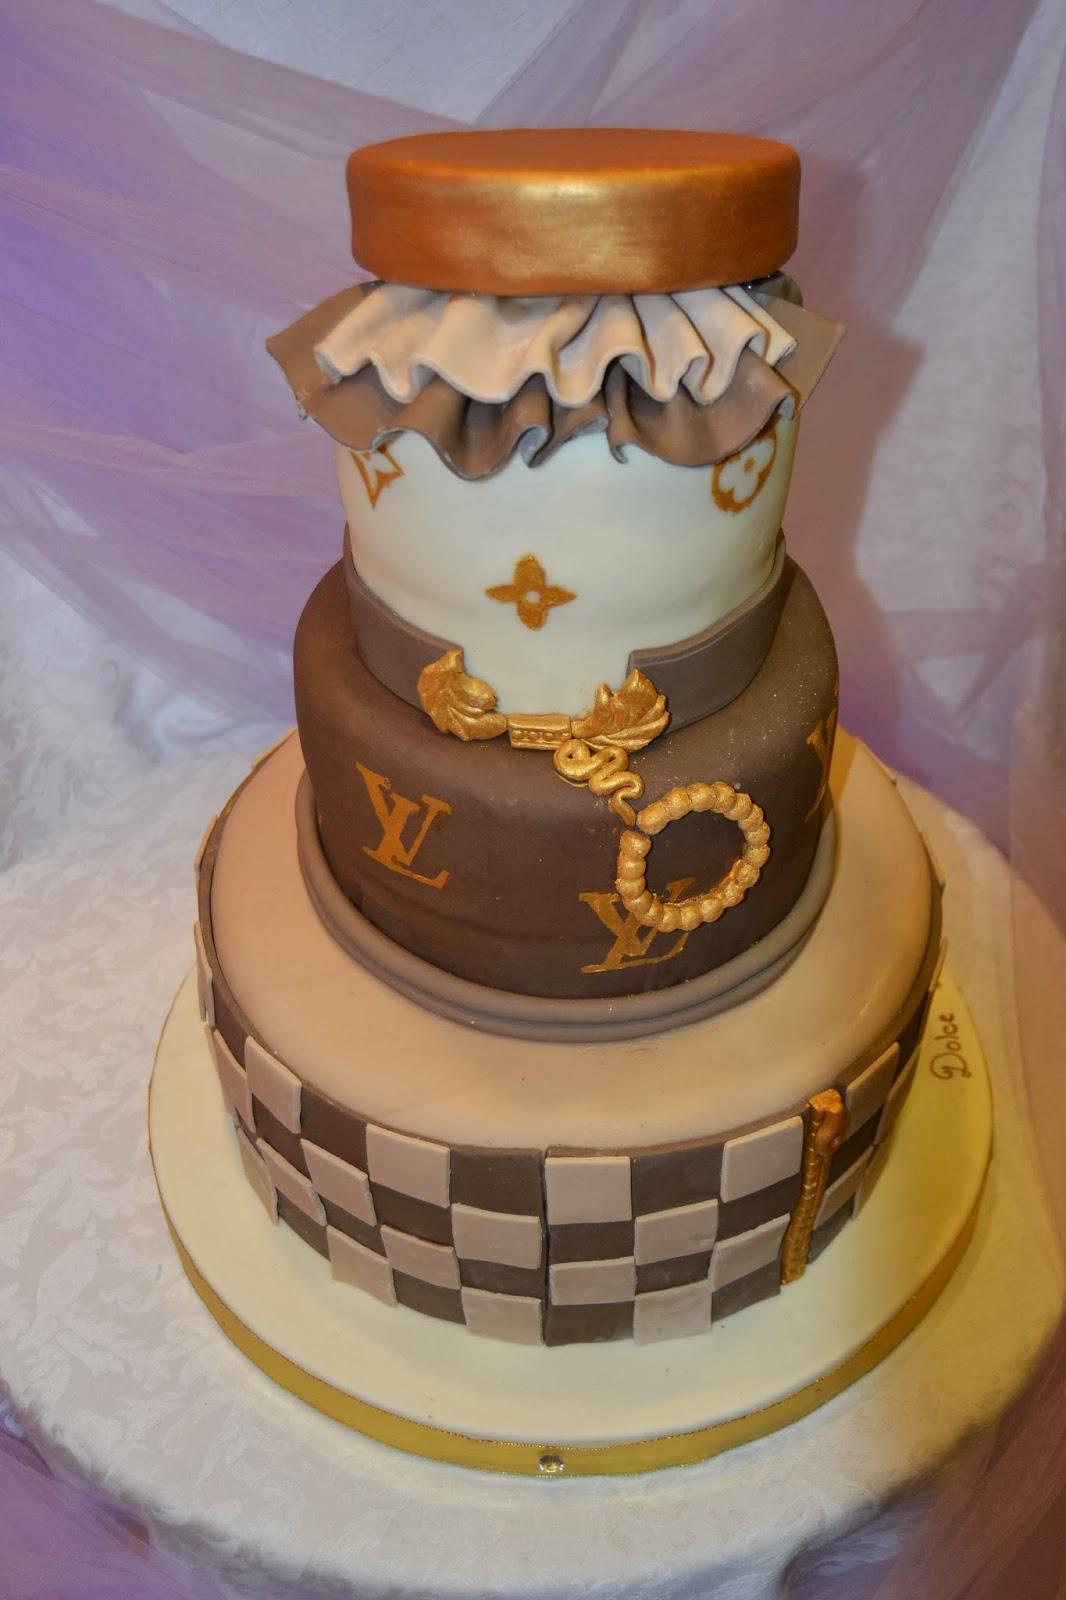 Cake design torte 18 anni My-Rome...